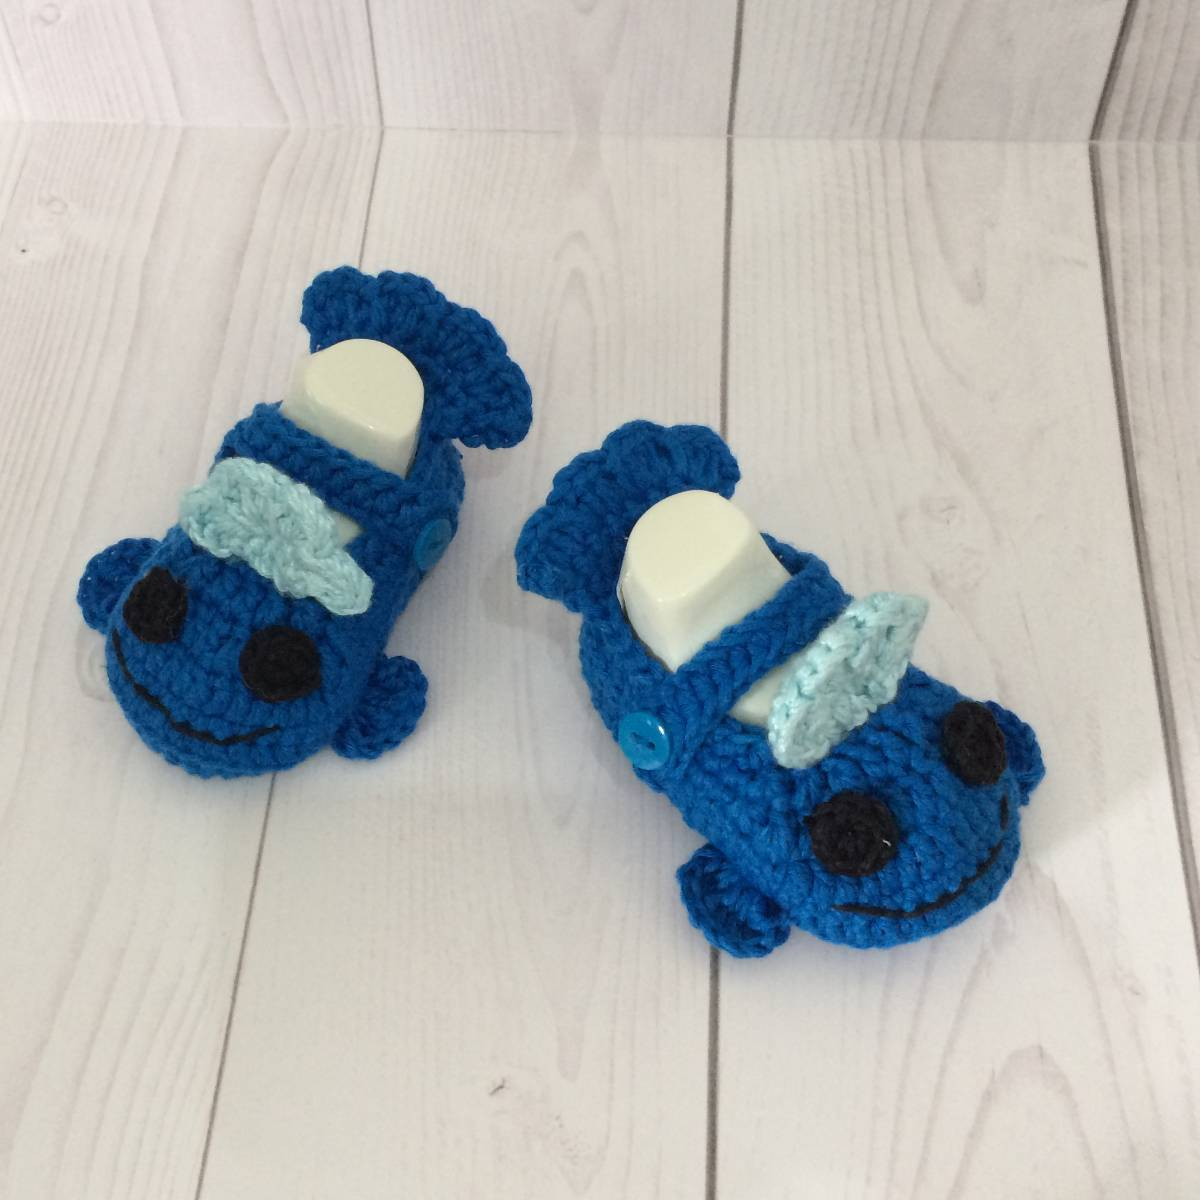 Sepatu Rajut Blue Fish